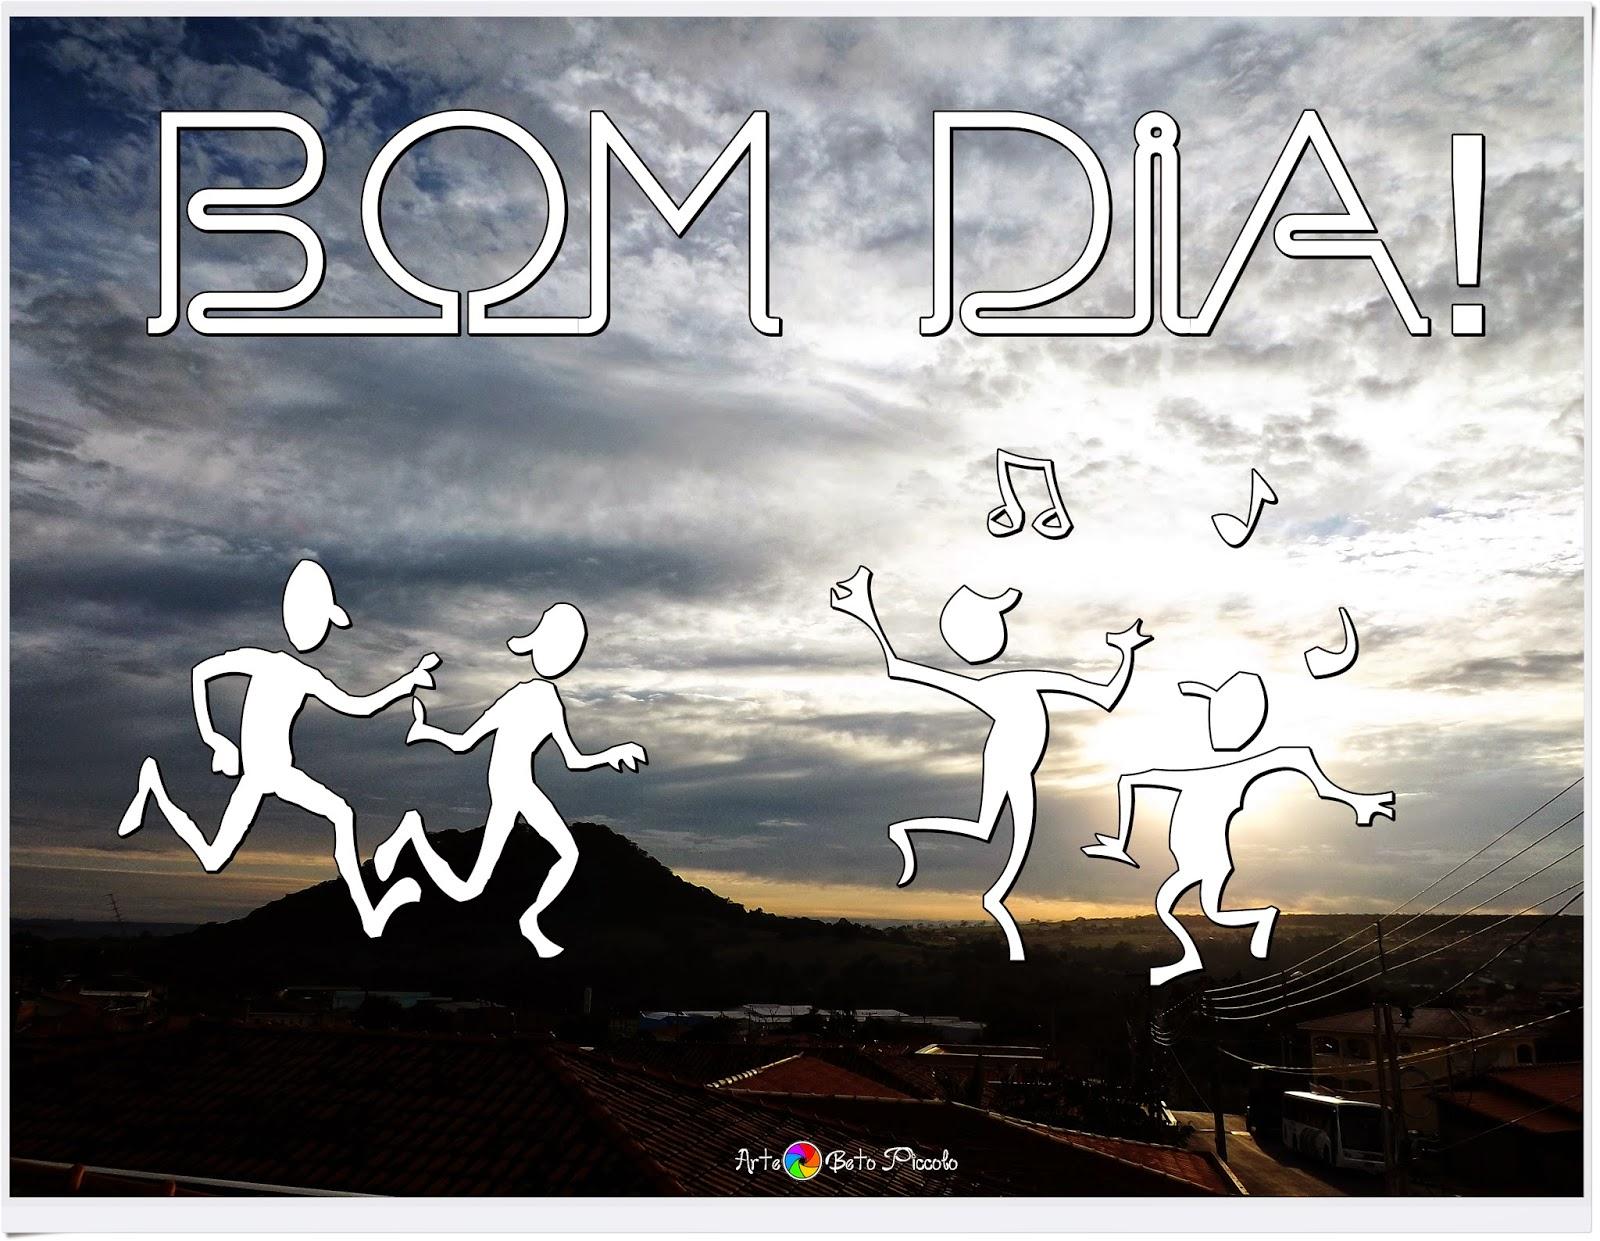 Beleza Da Vida Bom Dia: Beto Piccolo: 07/05/2014